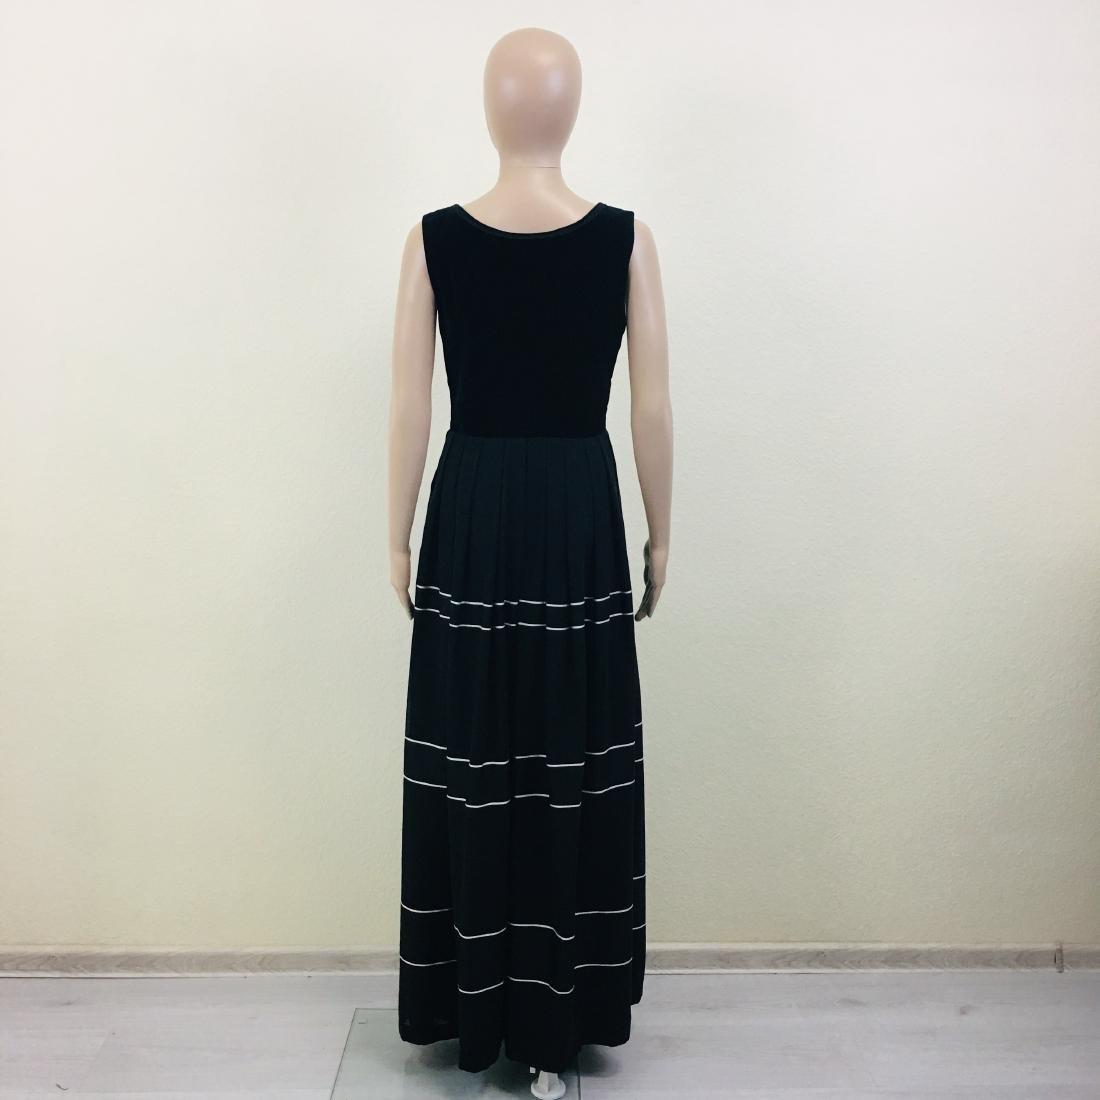 Vintage Women's Black Tyrolean Drindl Dress - 7